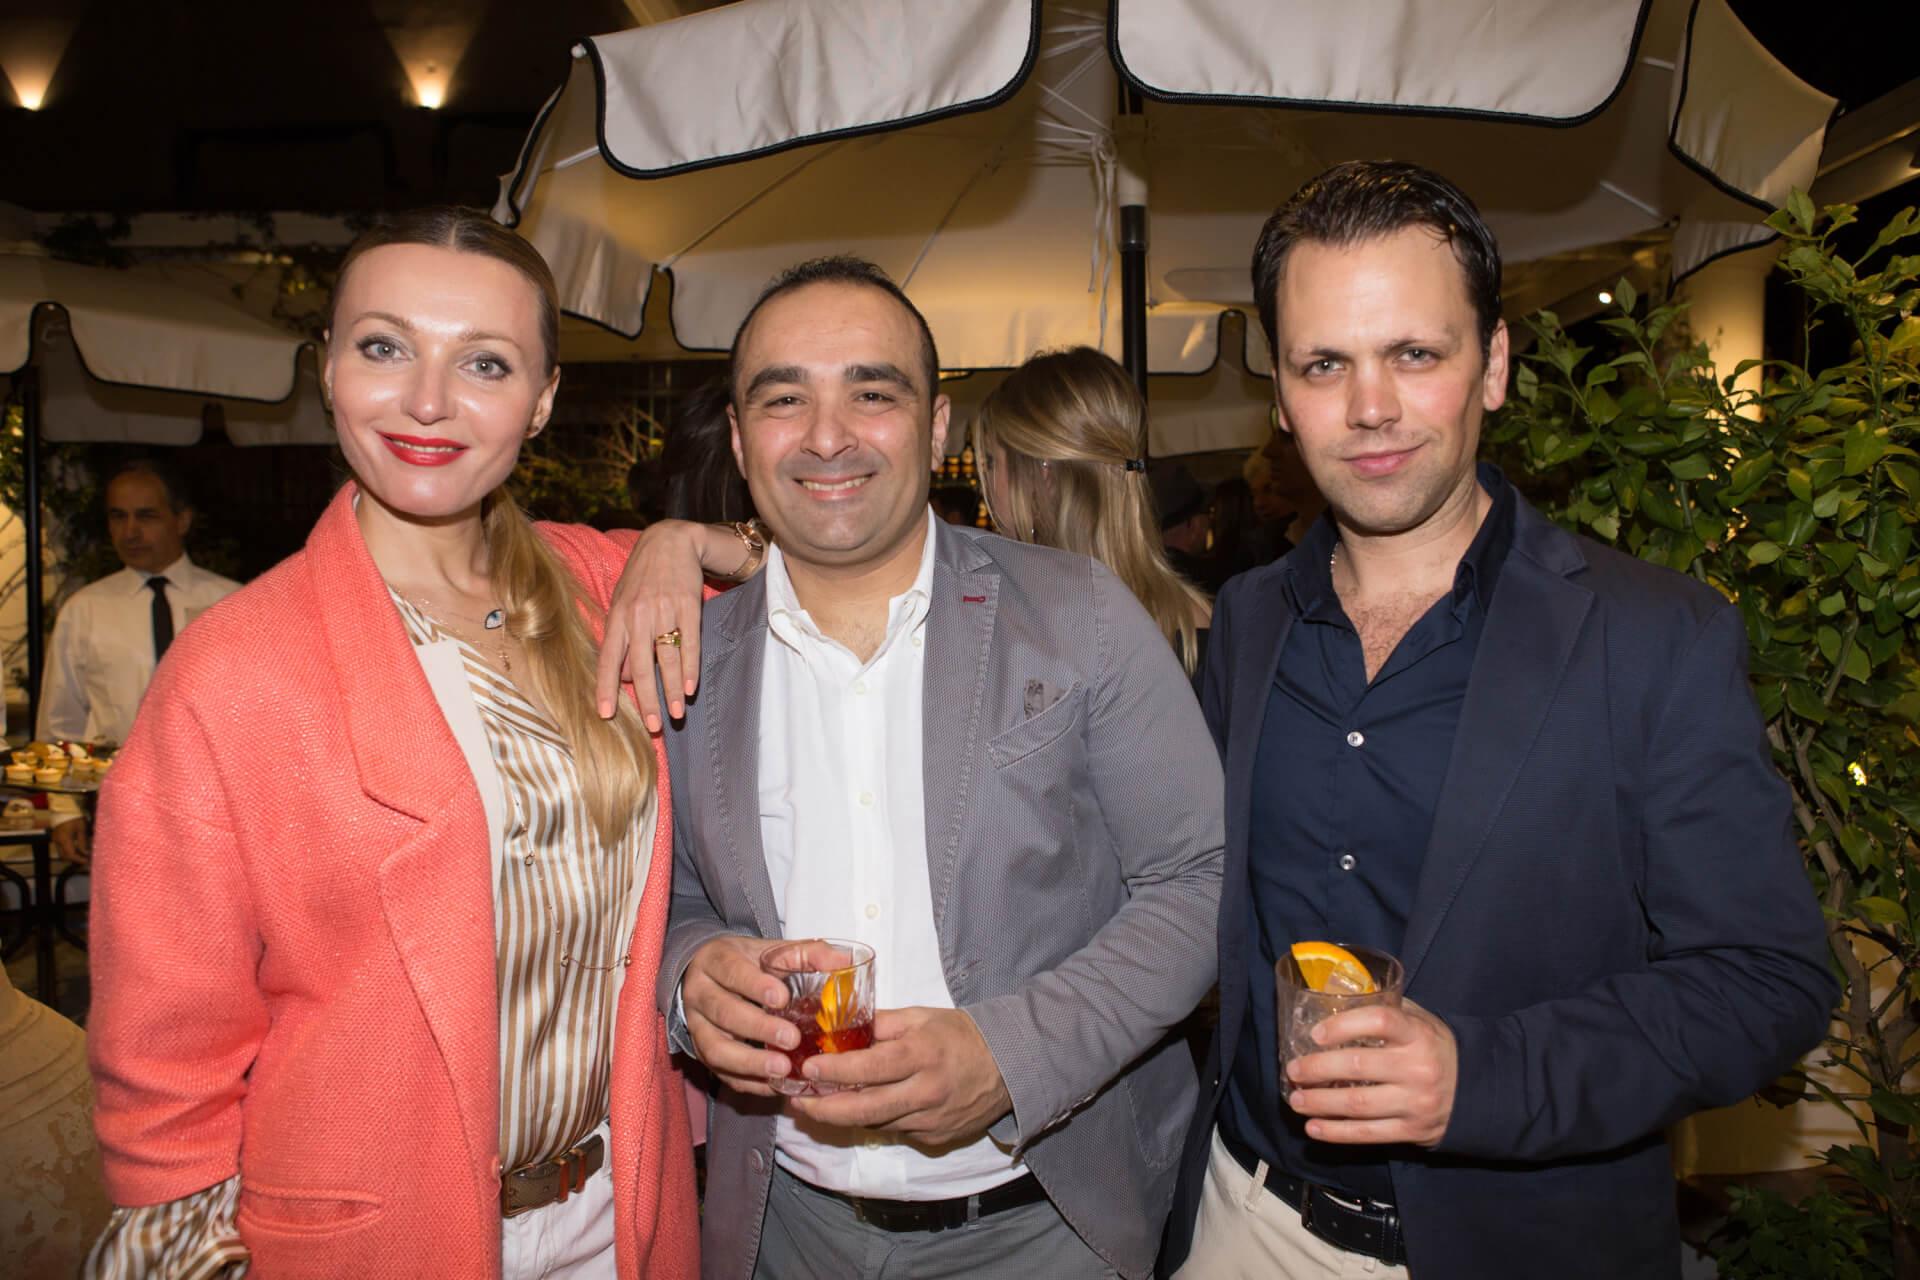 Natasha Boiarciuc, Giovanni Monti, Giuseppe Greco